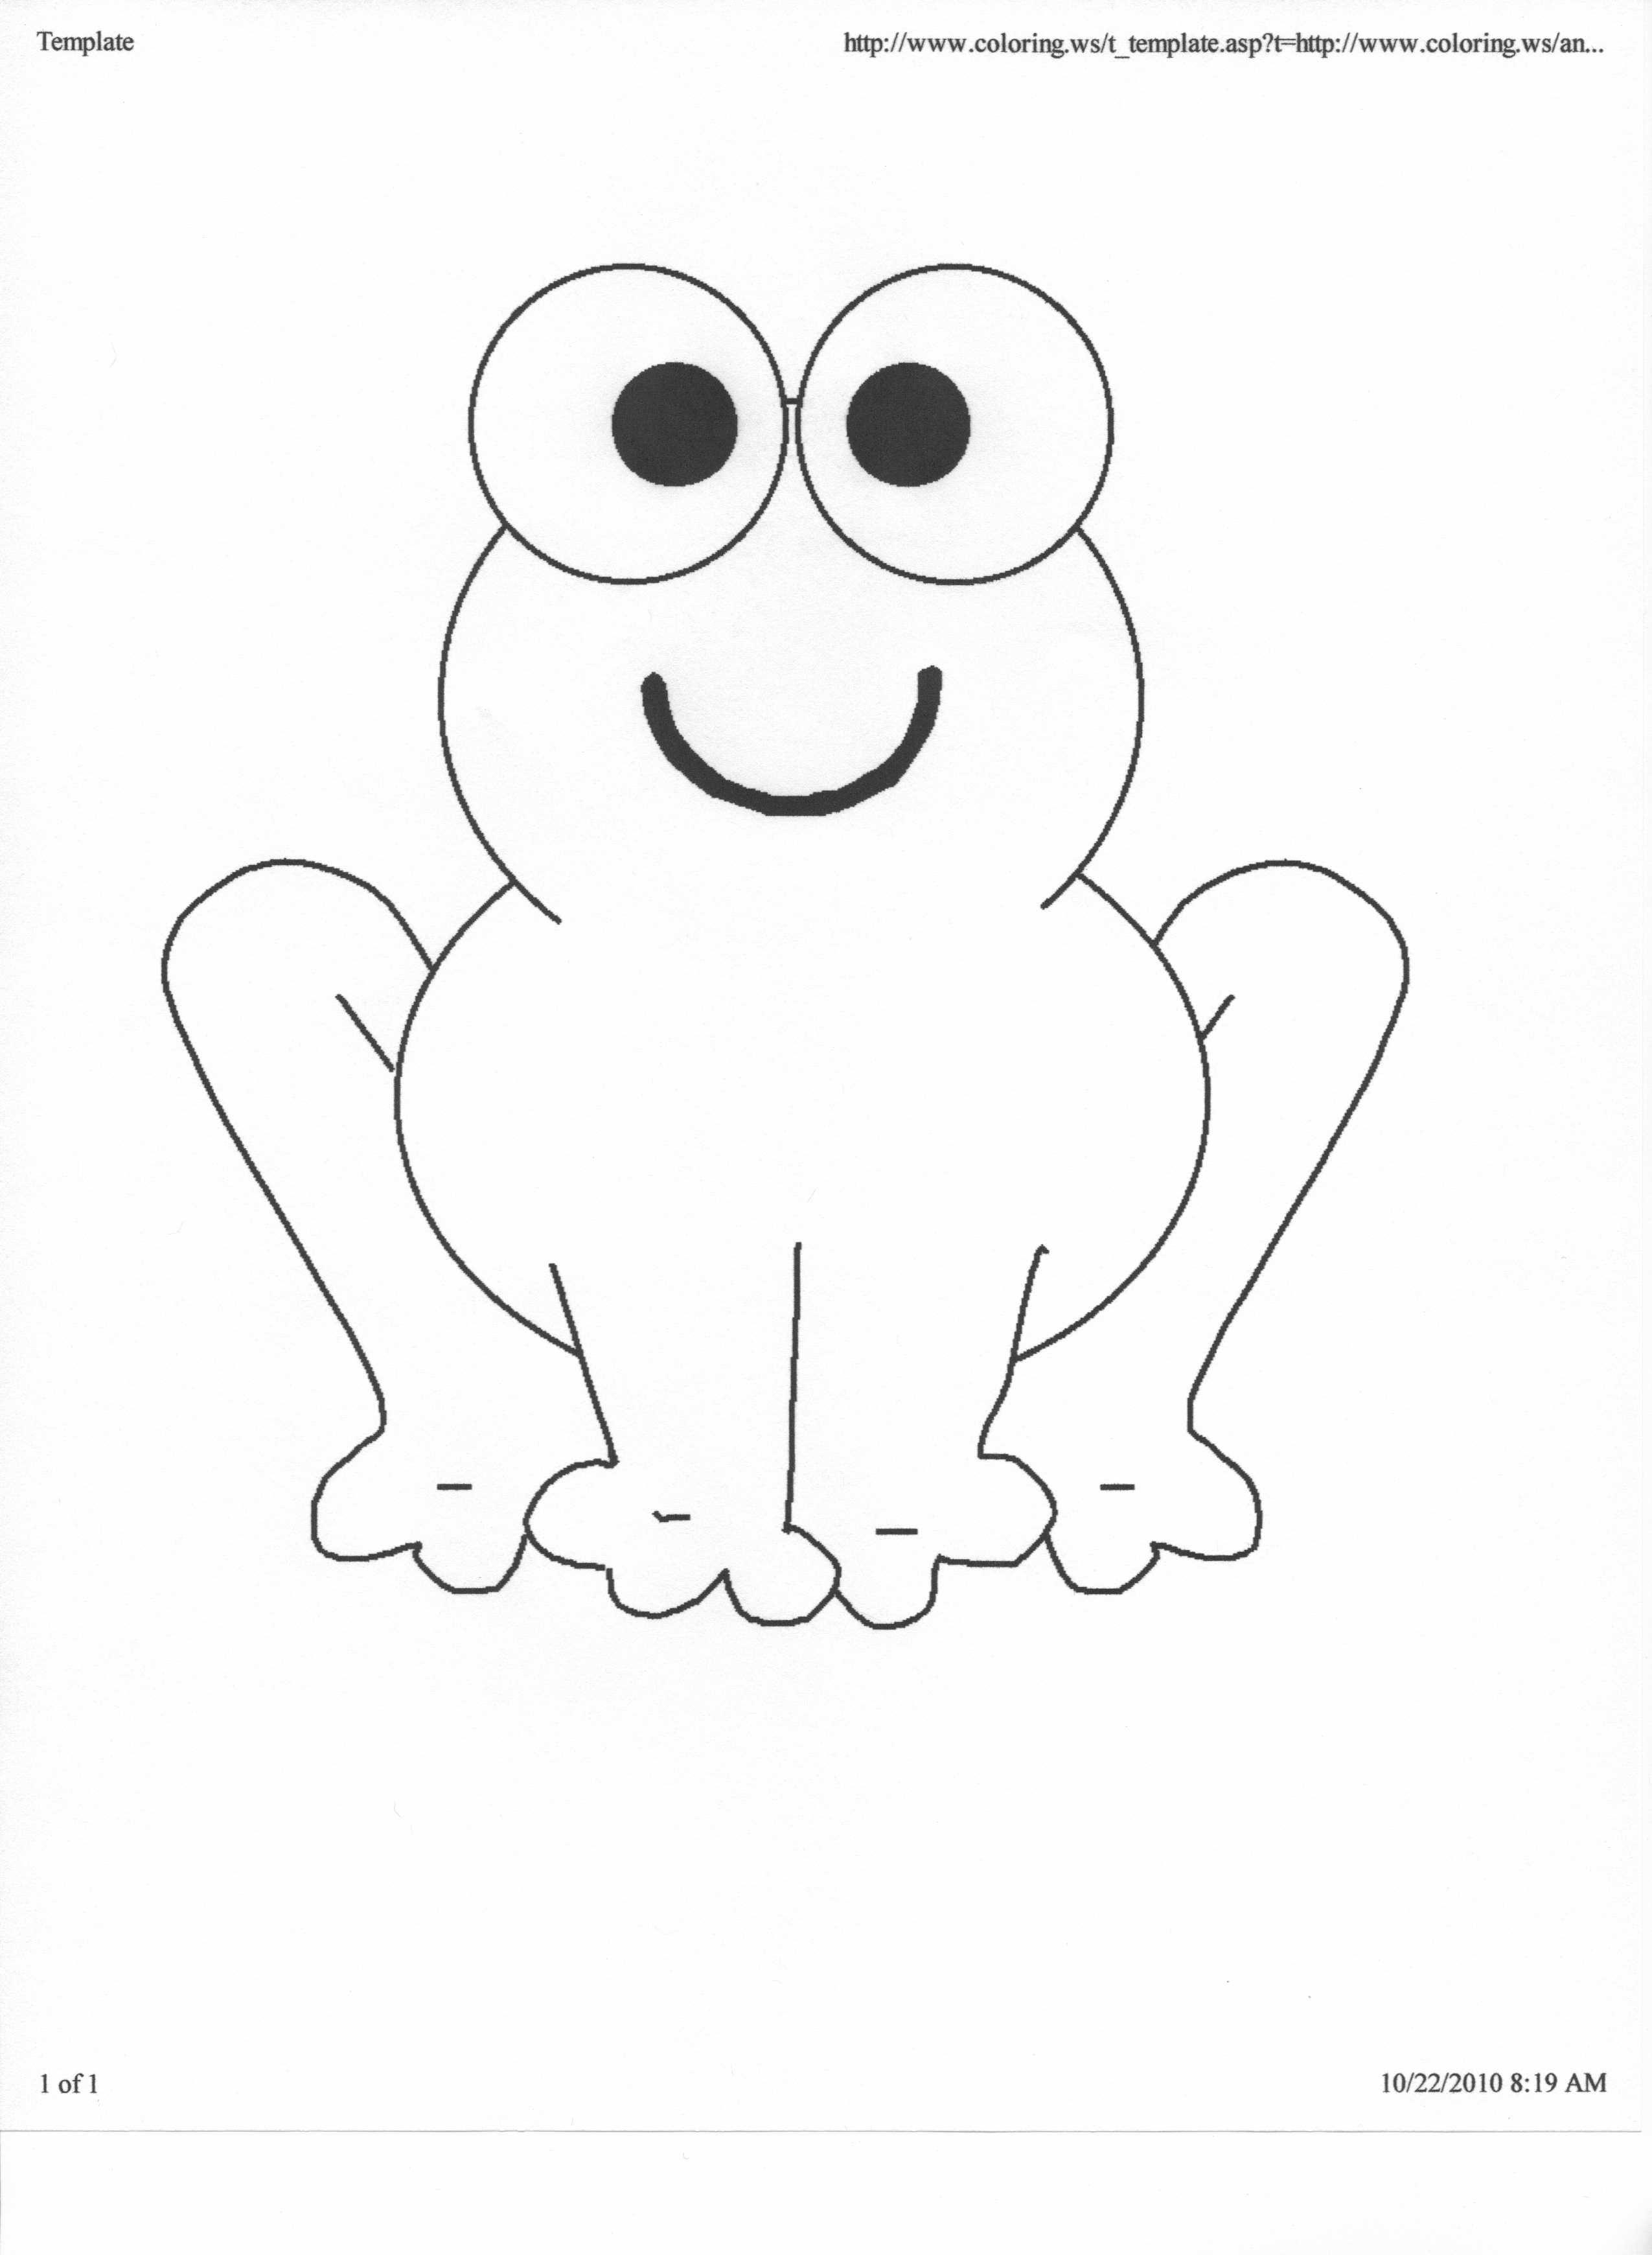 Printable Frog Clip Art Free Stencils Printables Free Stencils Stencils Printables